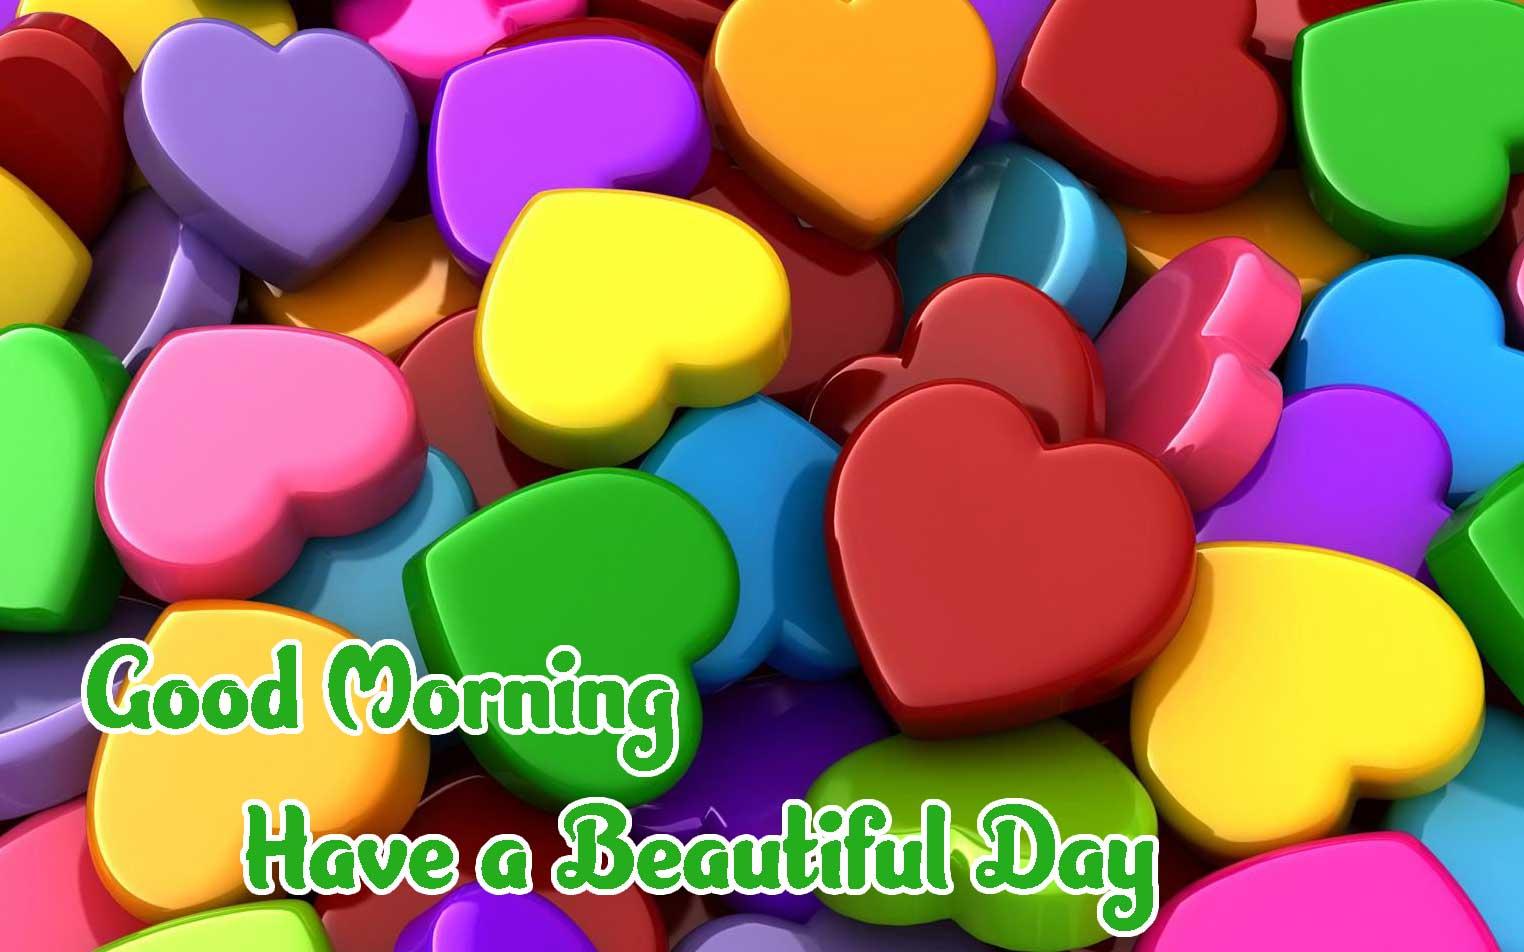 Amazing 1080 p Good Morning 4k ImagesPics HD Download